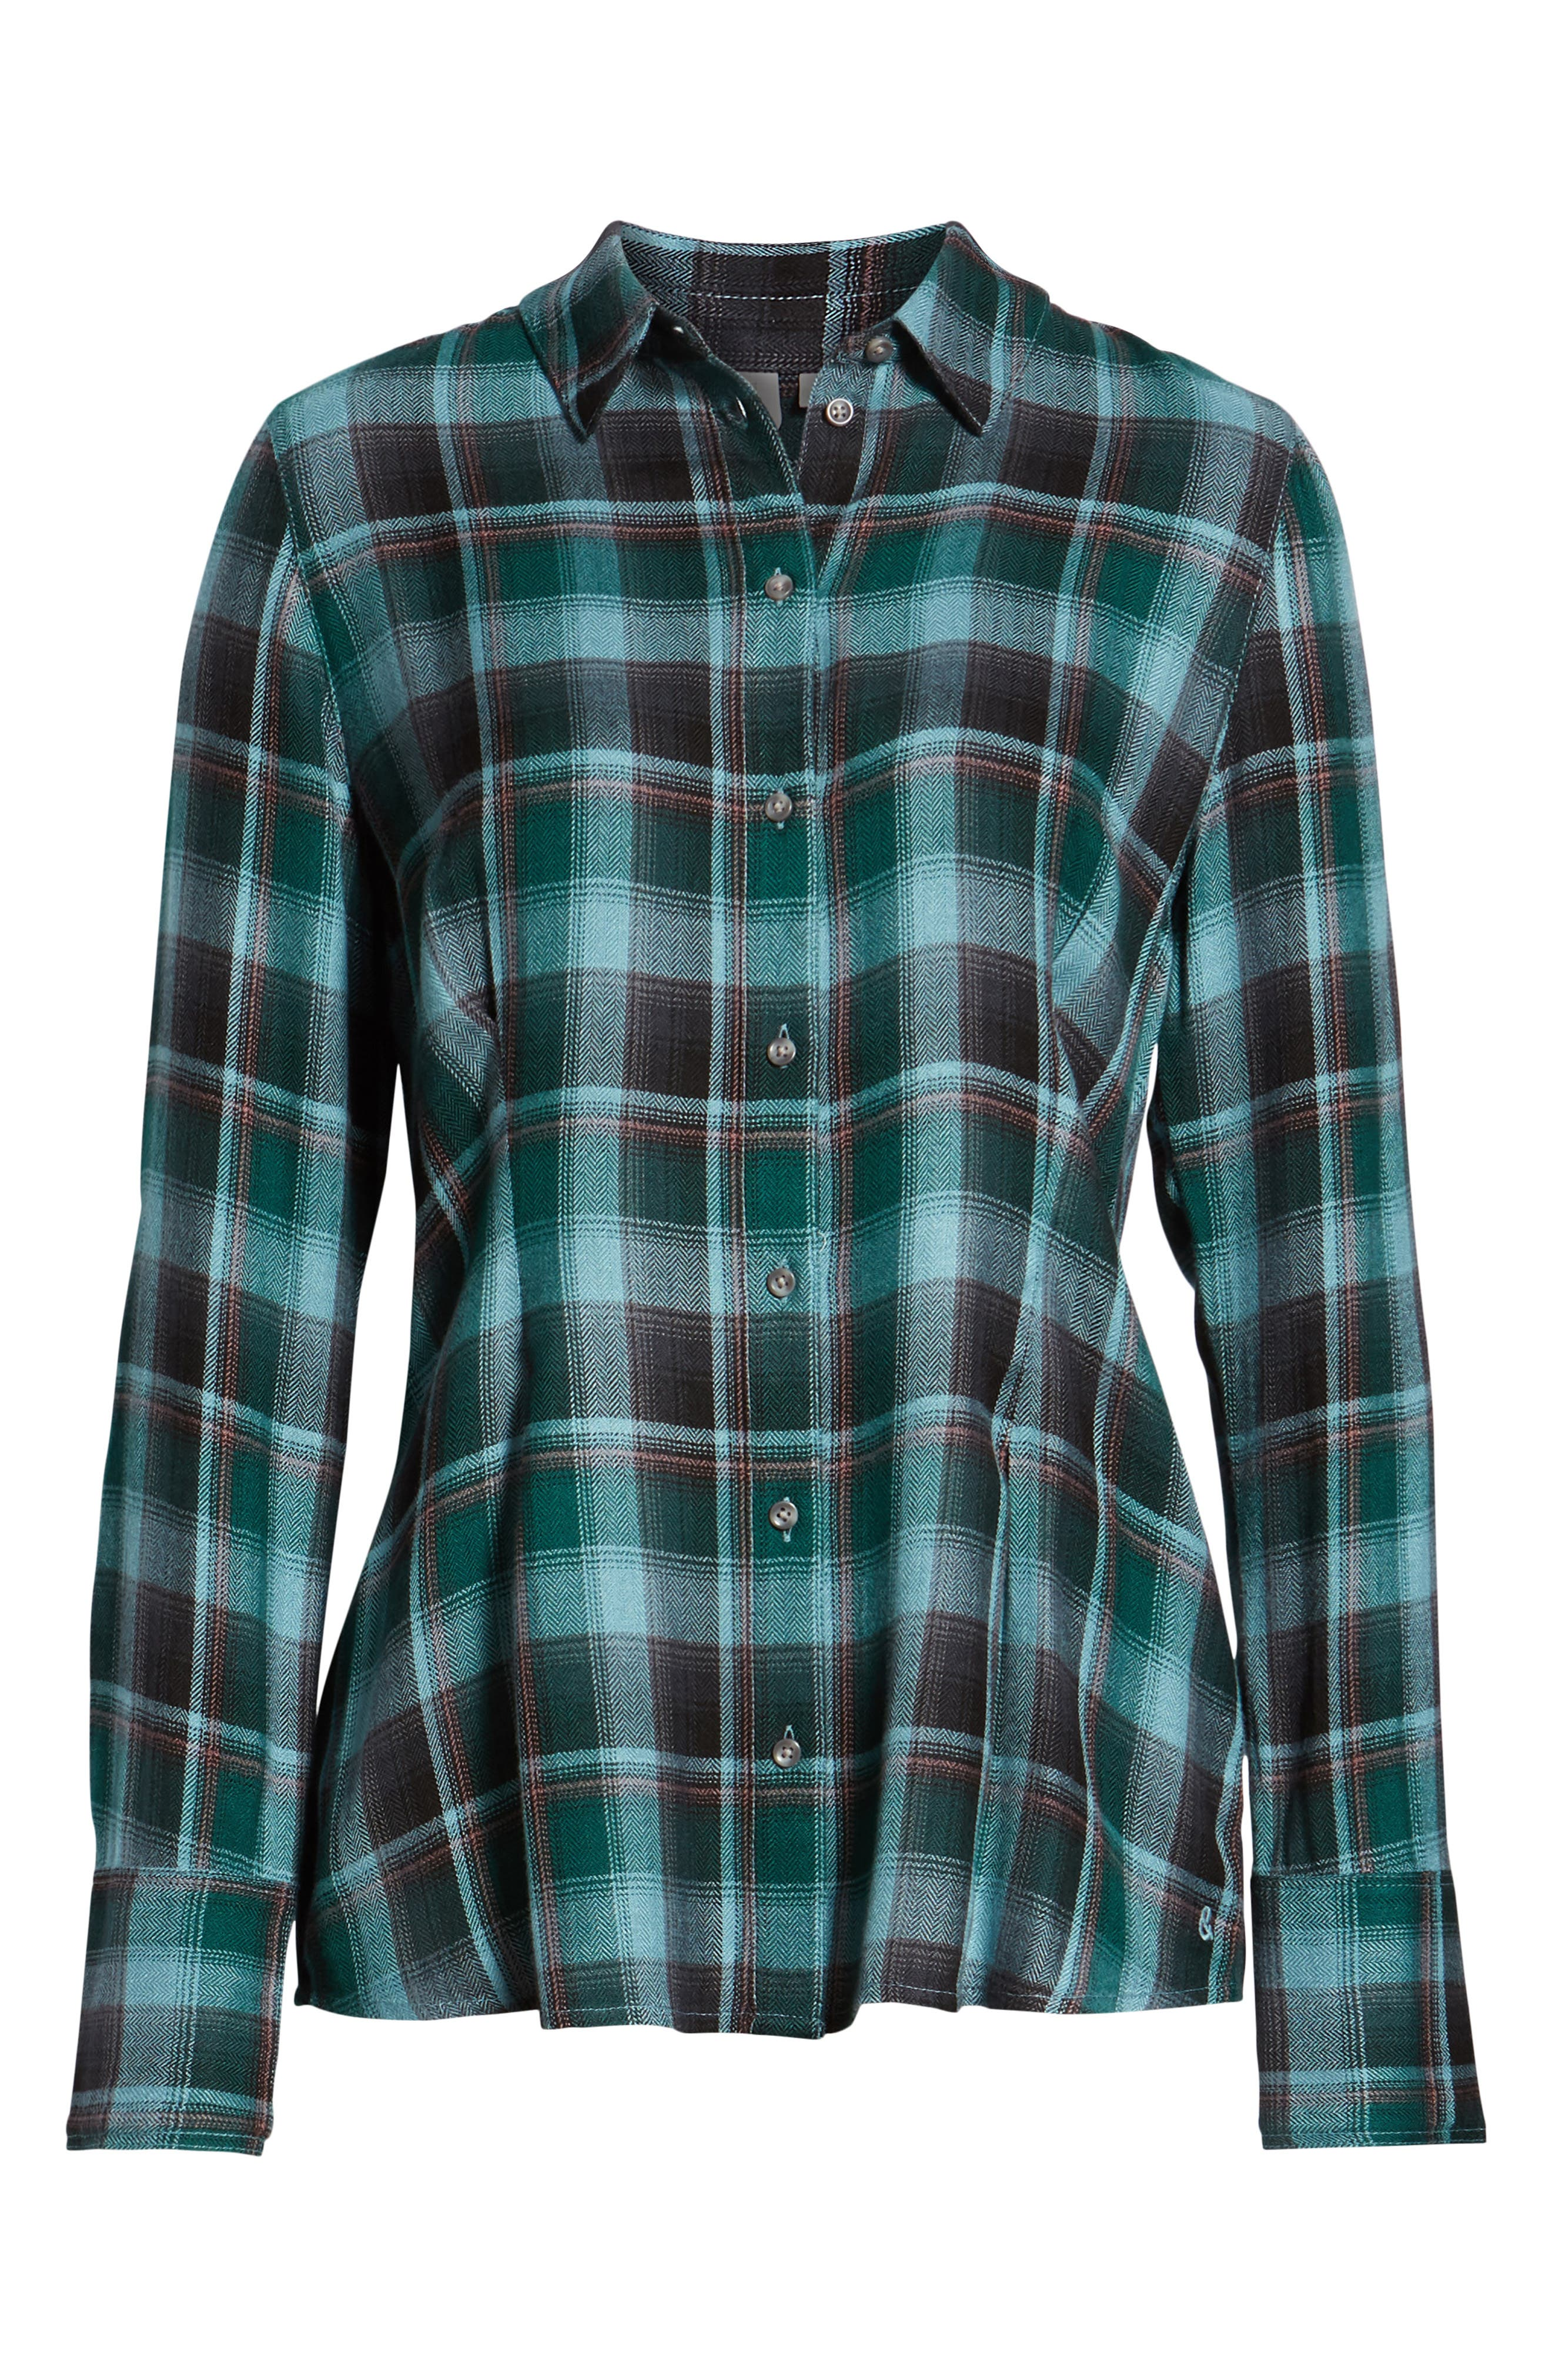 Plaid Corset Shirt,                             Alternate thumbnail 6, color,                             BLUE SMOKE BLANKET CHECK